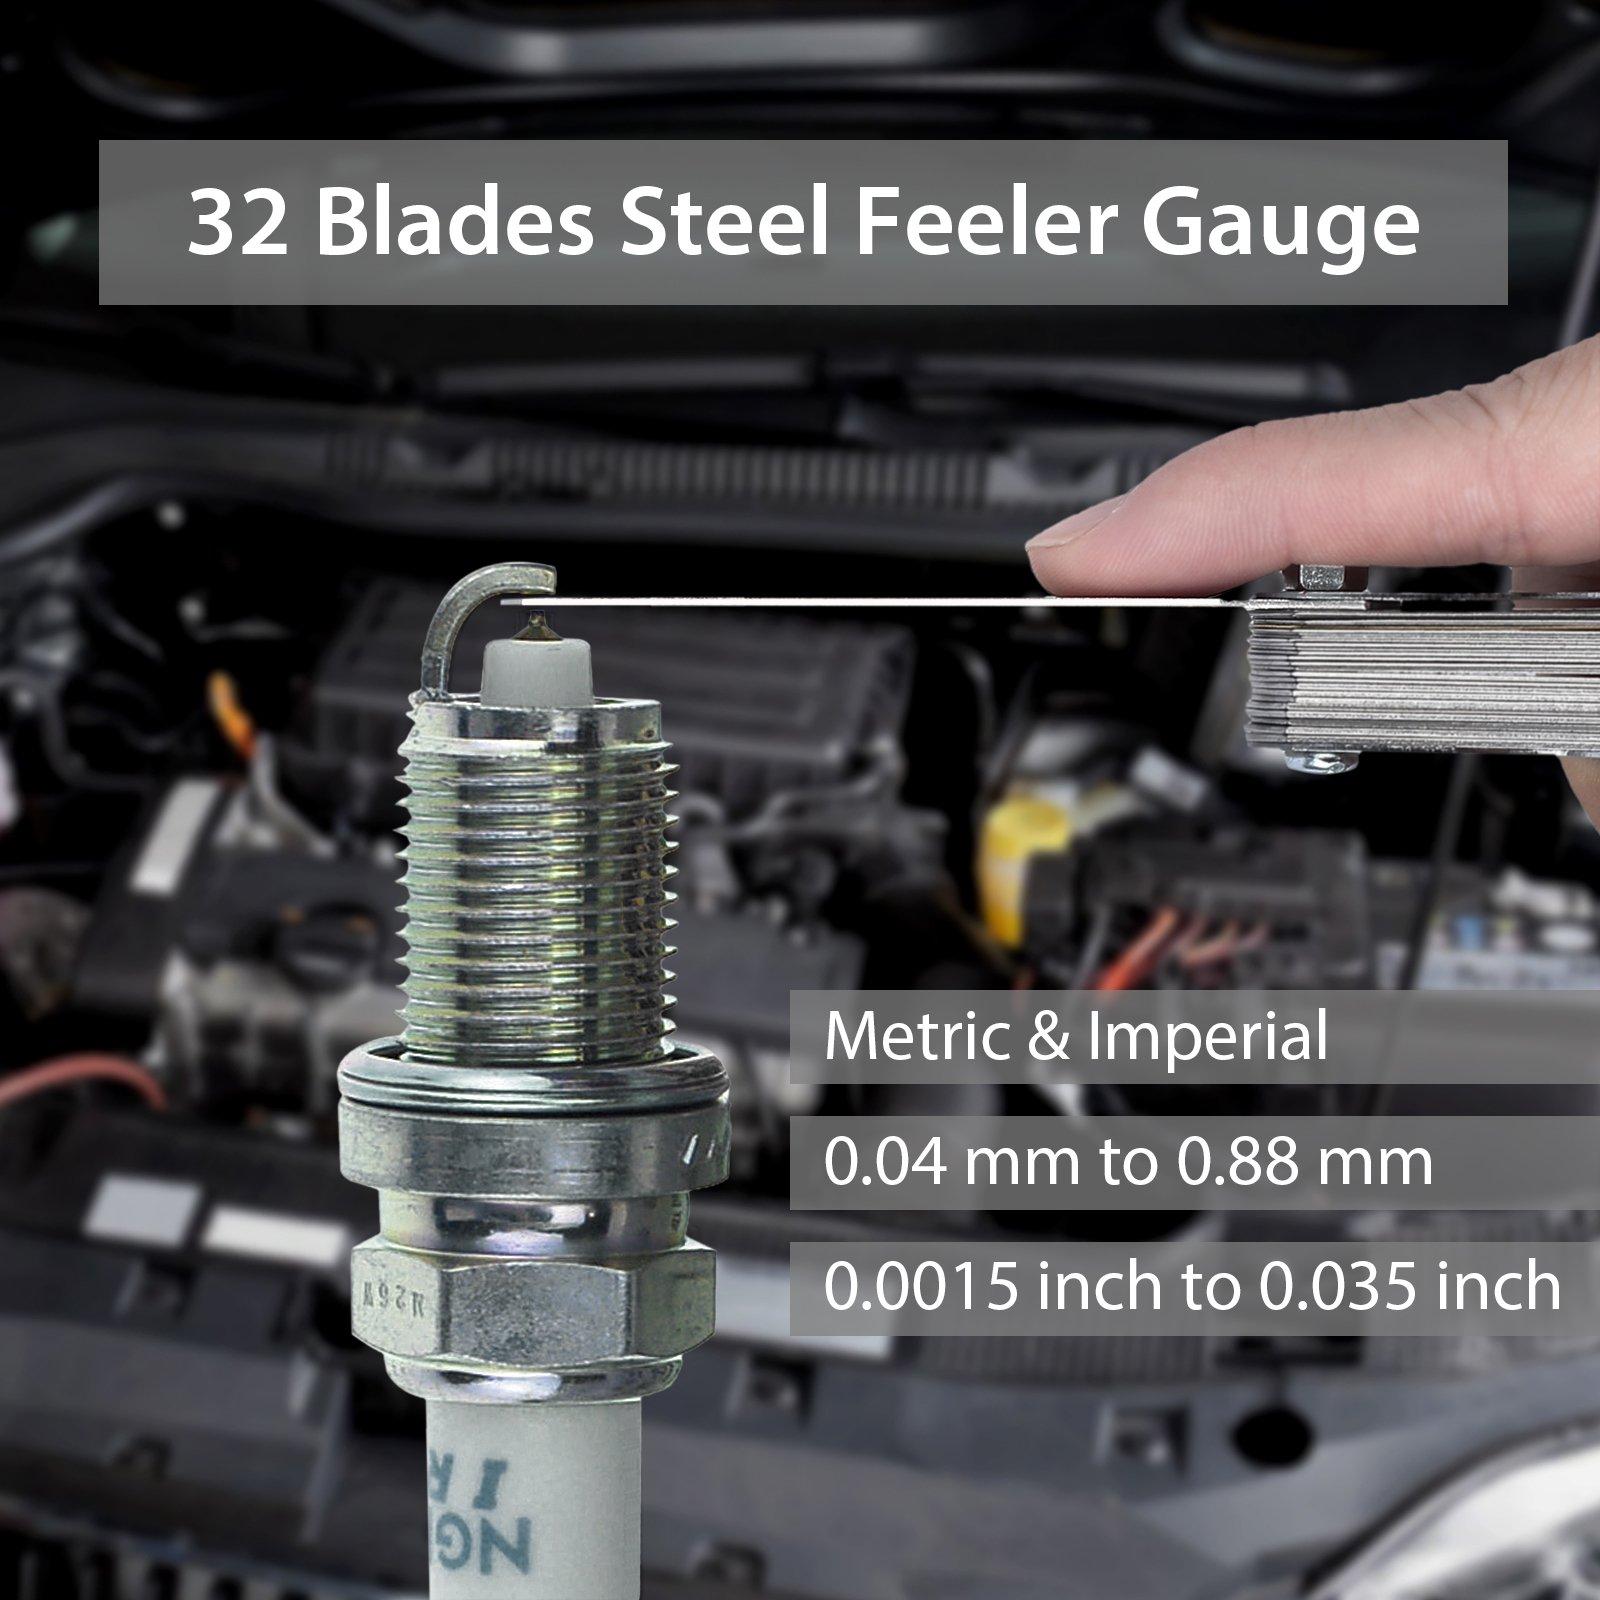 Digital Vernier Caliper + Feeler Gauge Neoteck 150mm/6Inch Stainless Steel Electronic Caliper Fractions/Inch/Metric Conversion Measuring Tool for Length Width Depth Inner Diameter Outer Diameter by Neoteck (Image #3)